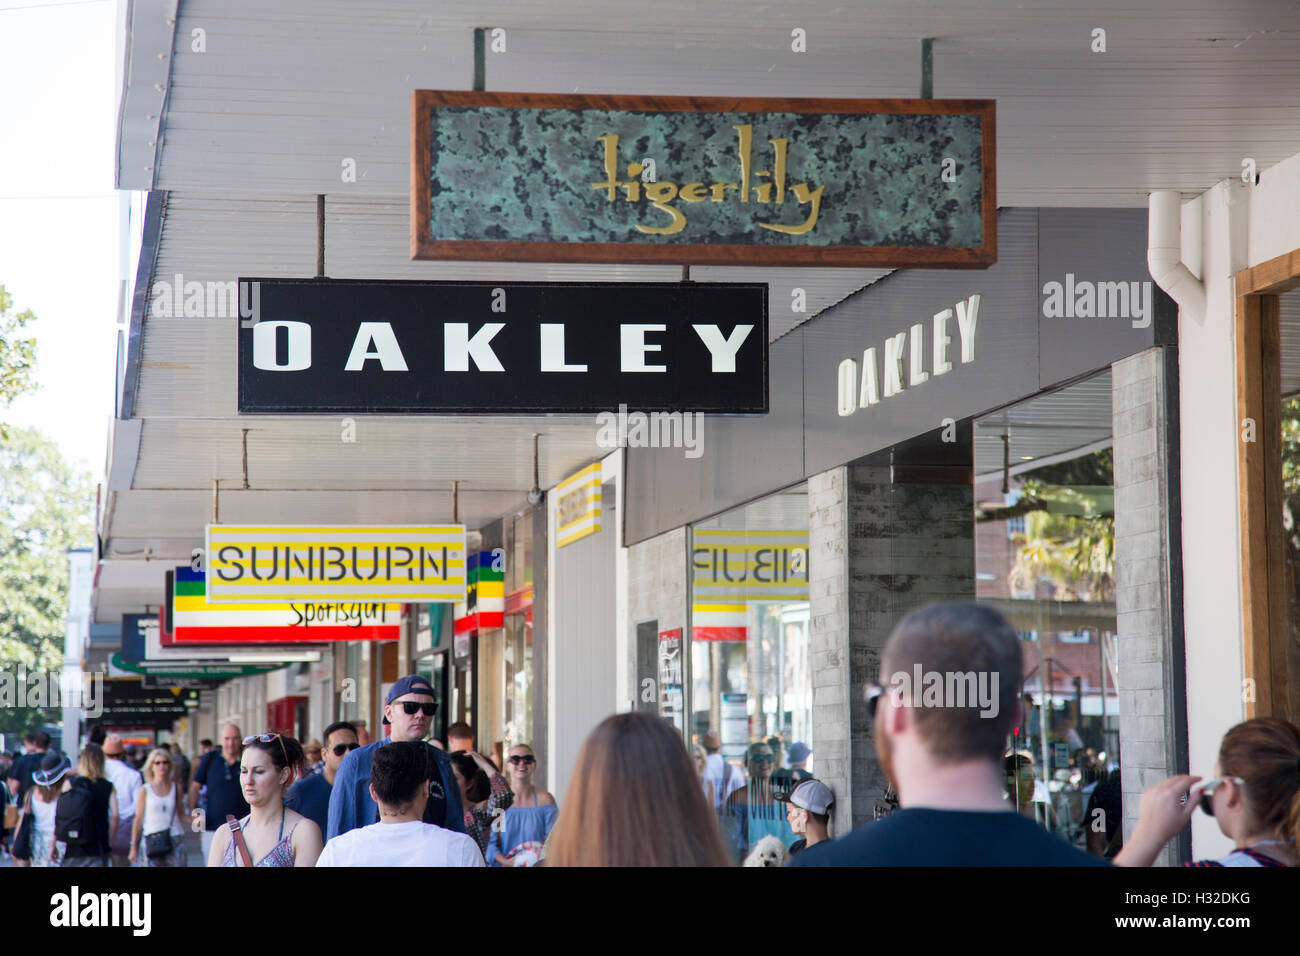 oakley clothing store. Black Bedroom Furniture Sets. Home Design Ideas